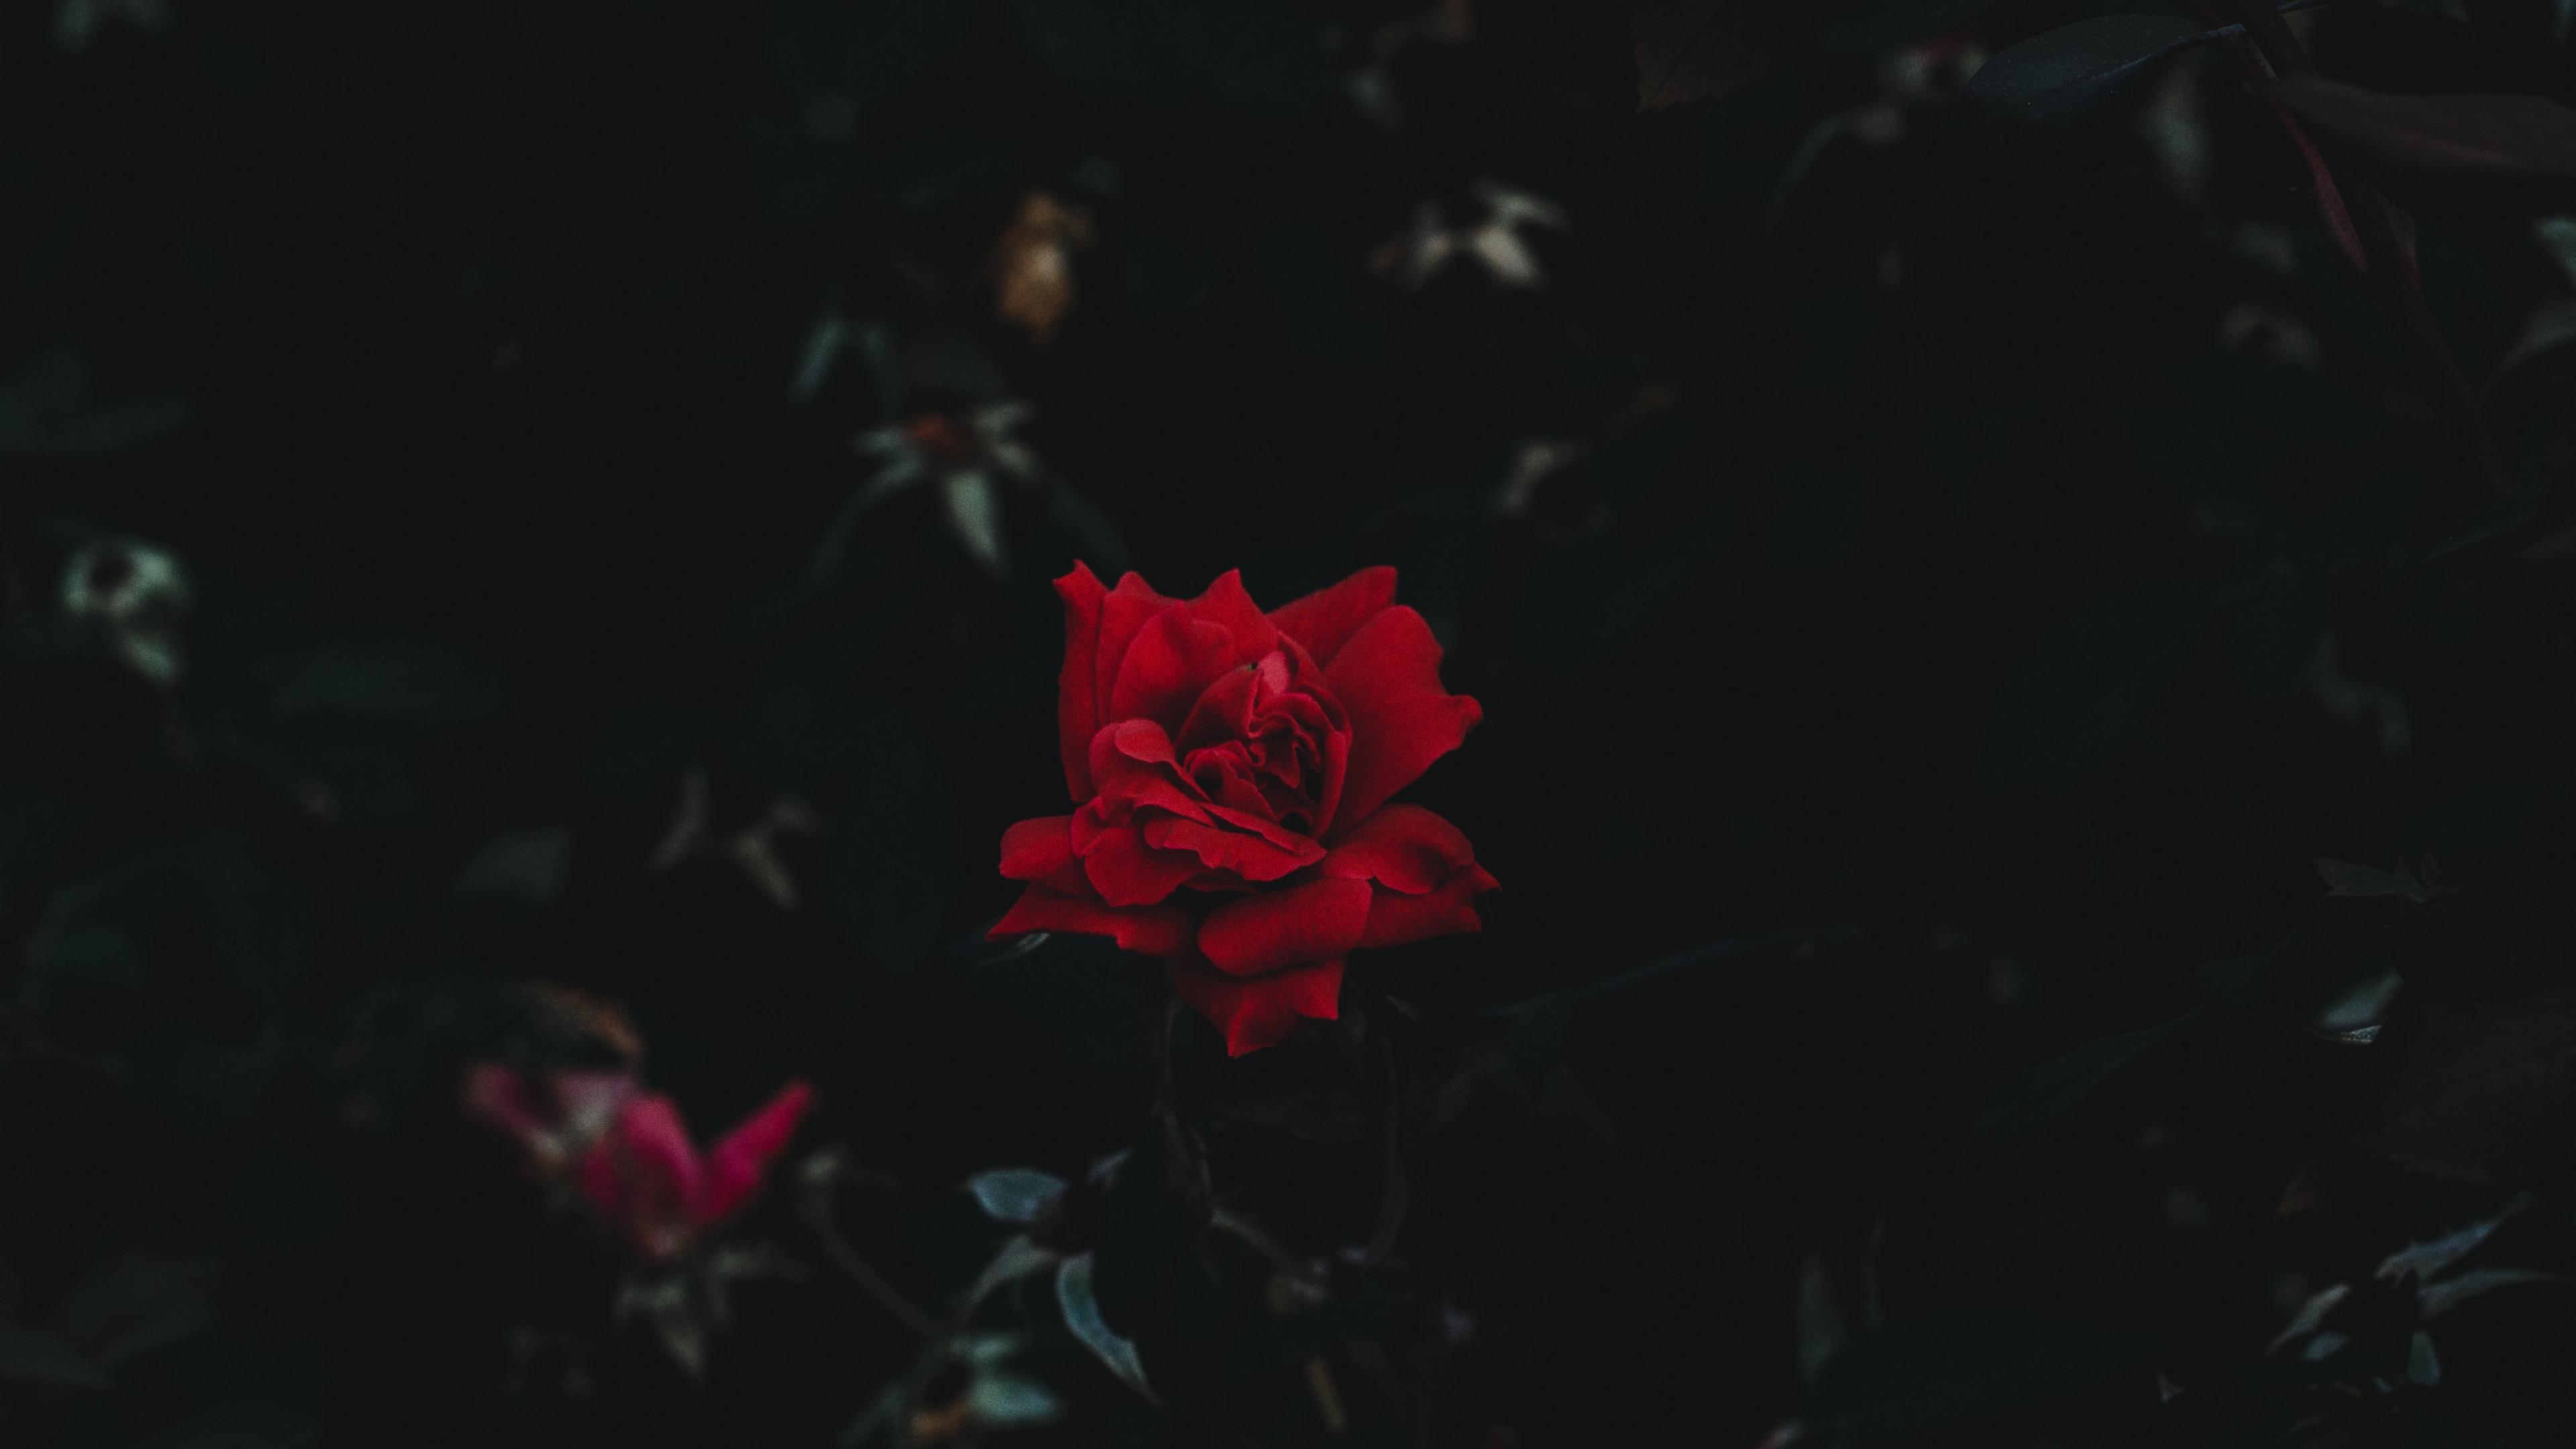 rose bud flower dark background 4k 1540575978 - rose, bud, flower, dark background 4k - Rose, flower, bud